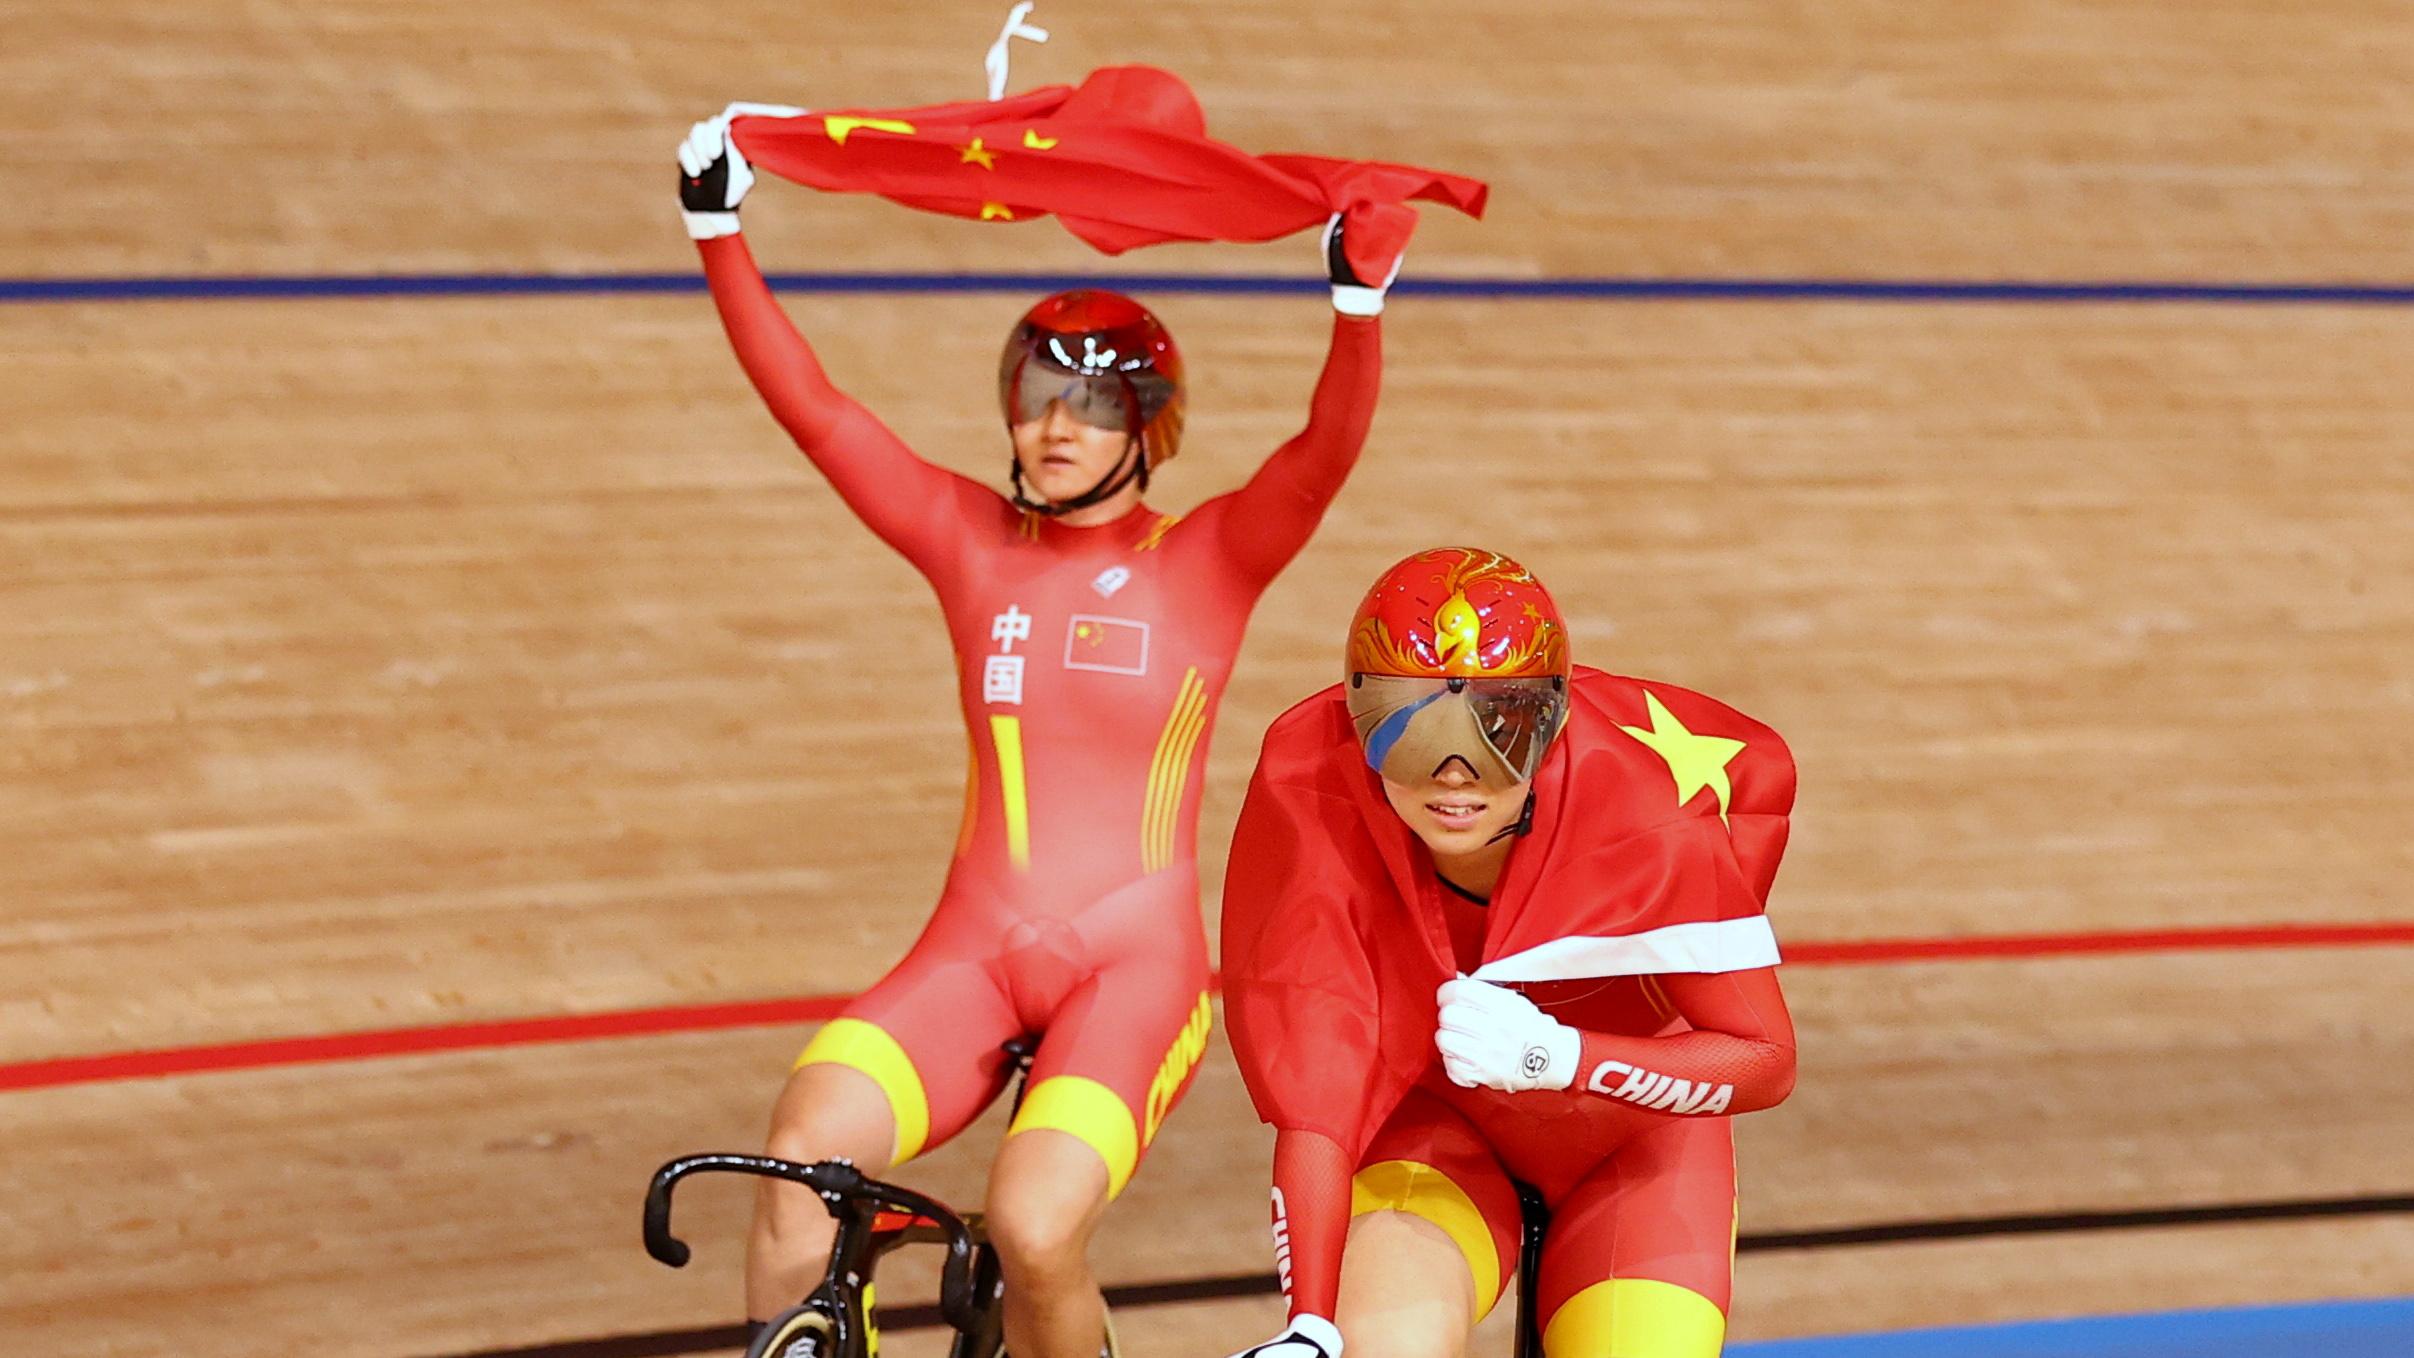 Tokyo 2020 Olympics - Cycling - Track - Women's Team Sprint - Gold Final - Izu Velodrome, Shizuoka, Japan - August 2, 2021. Bao Shanju of China and Zhong Tianshi of China celebrate winning the race and the gold medal REUTERS/Matthew Childs